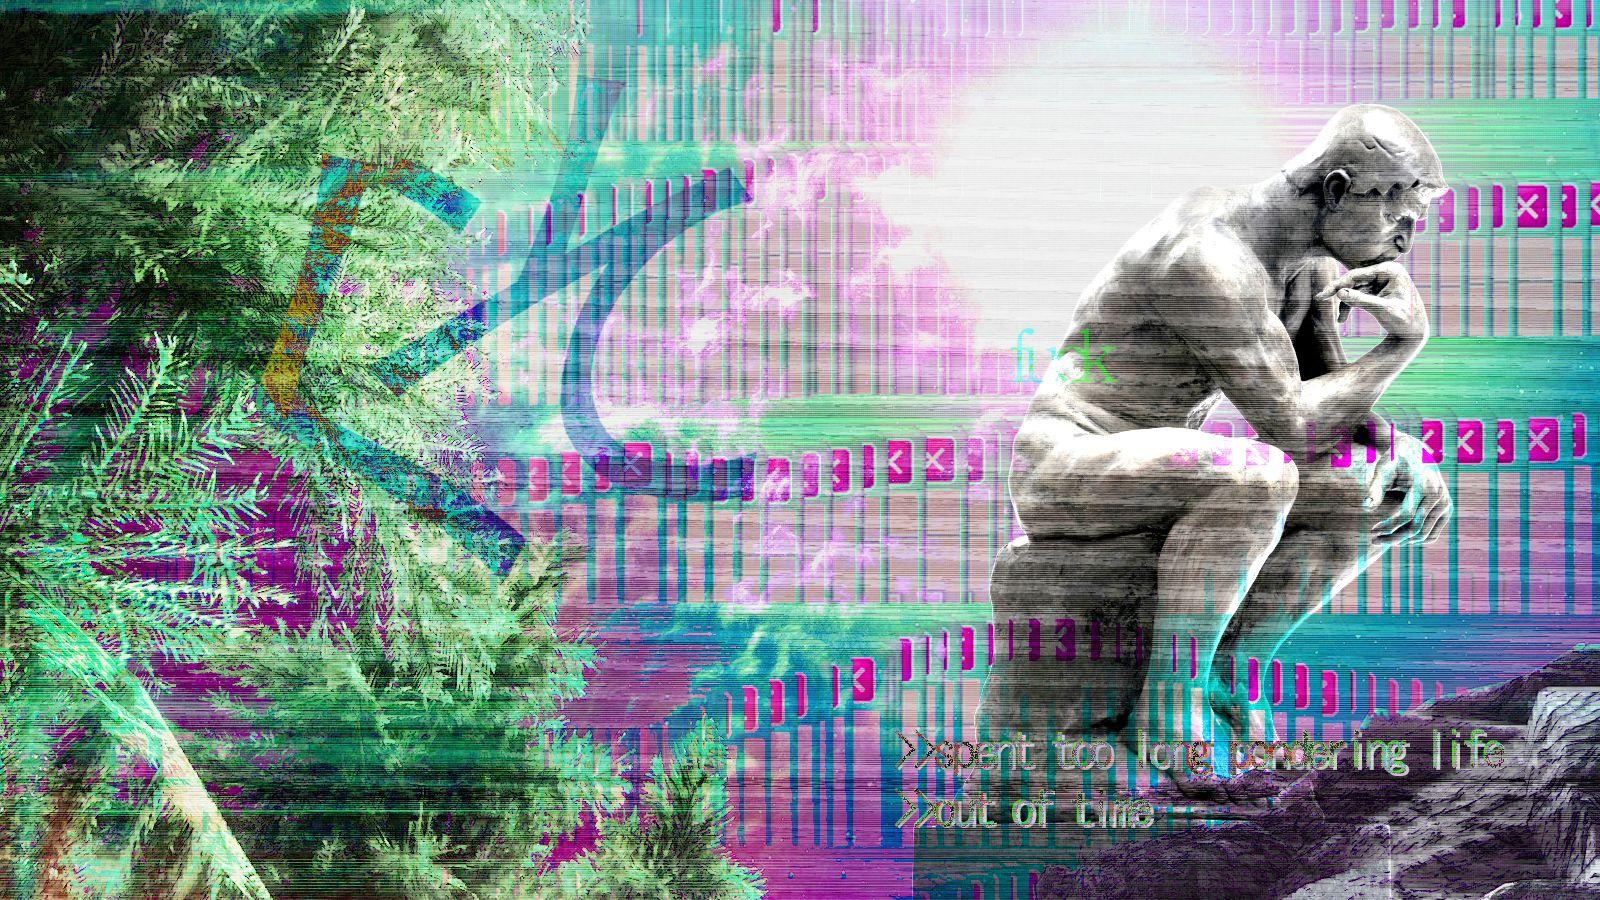 Vaporwave Aesthetic Wallpaper Desktop